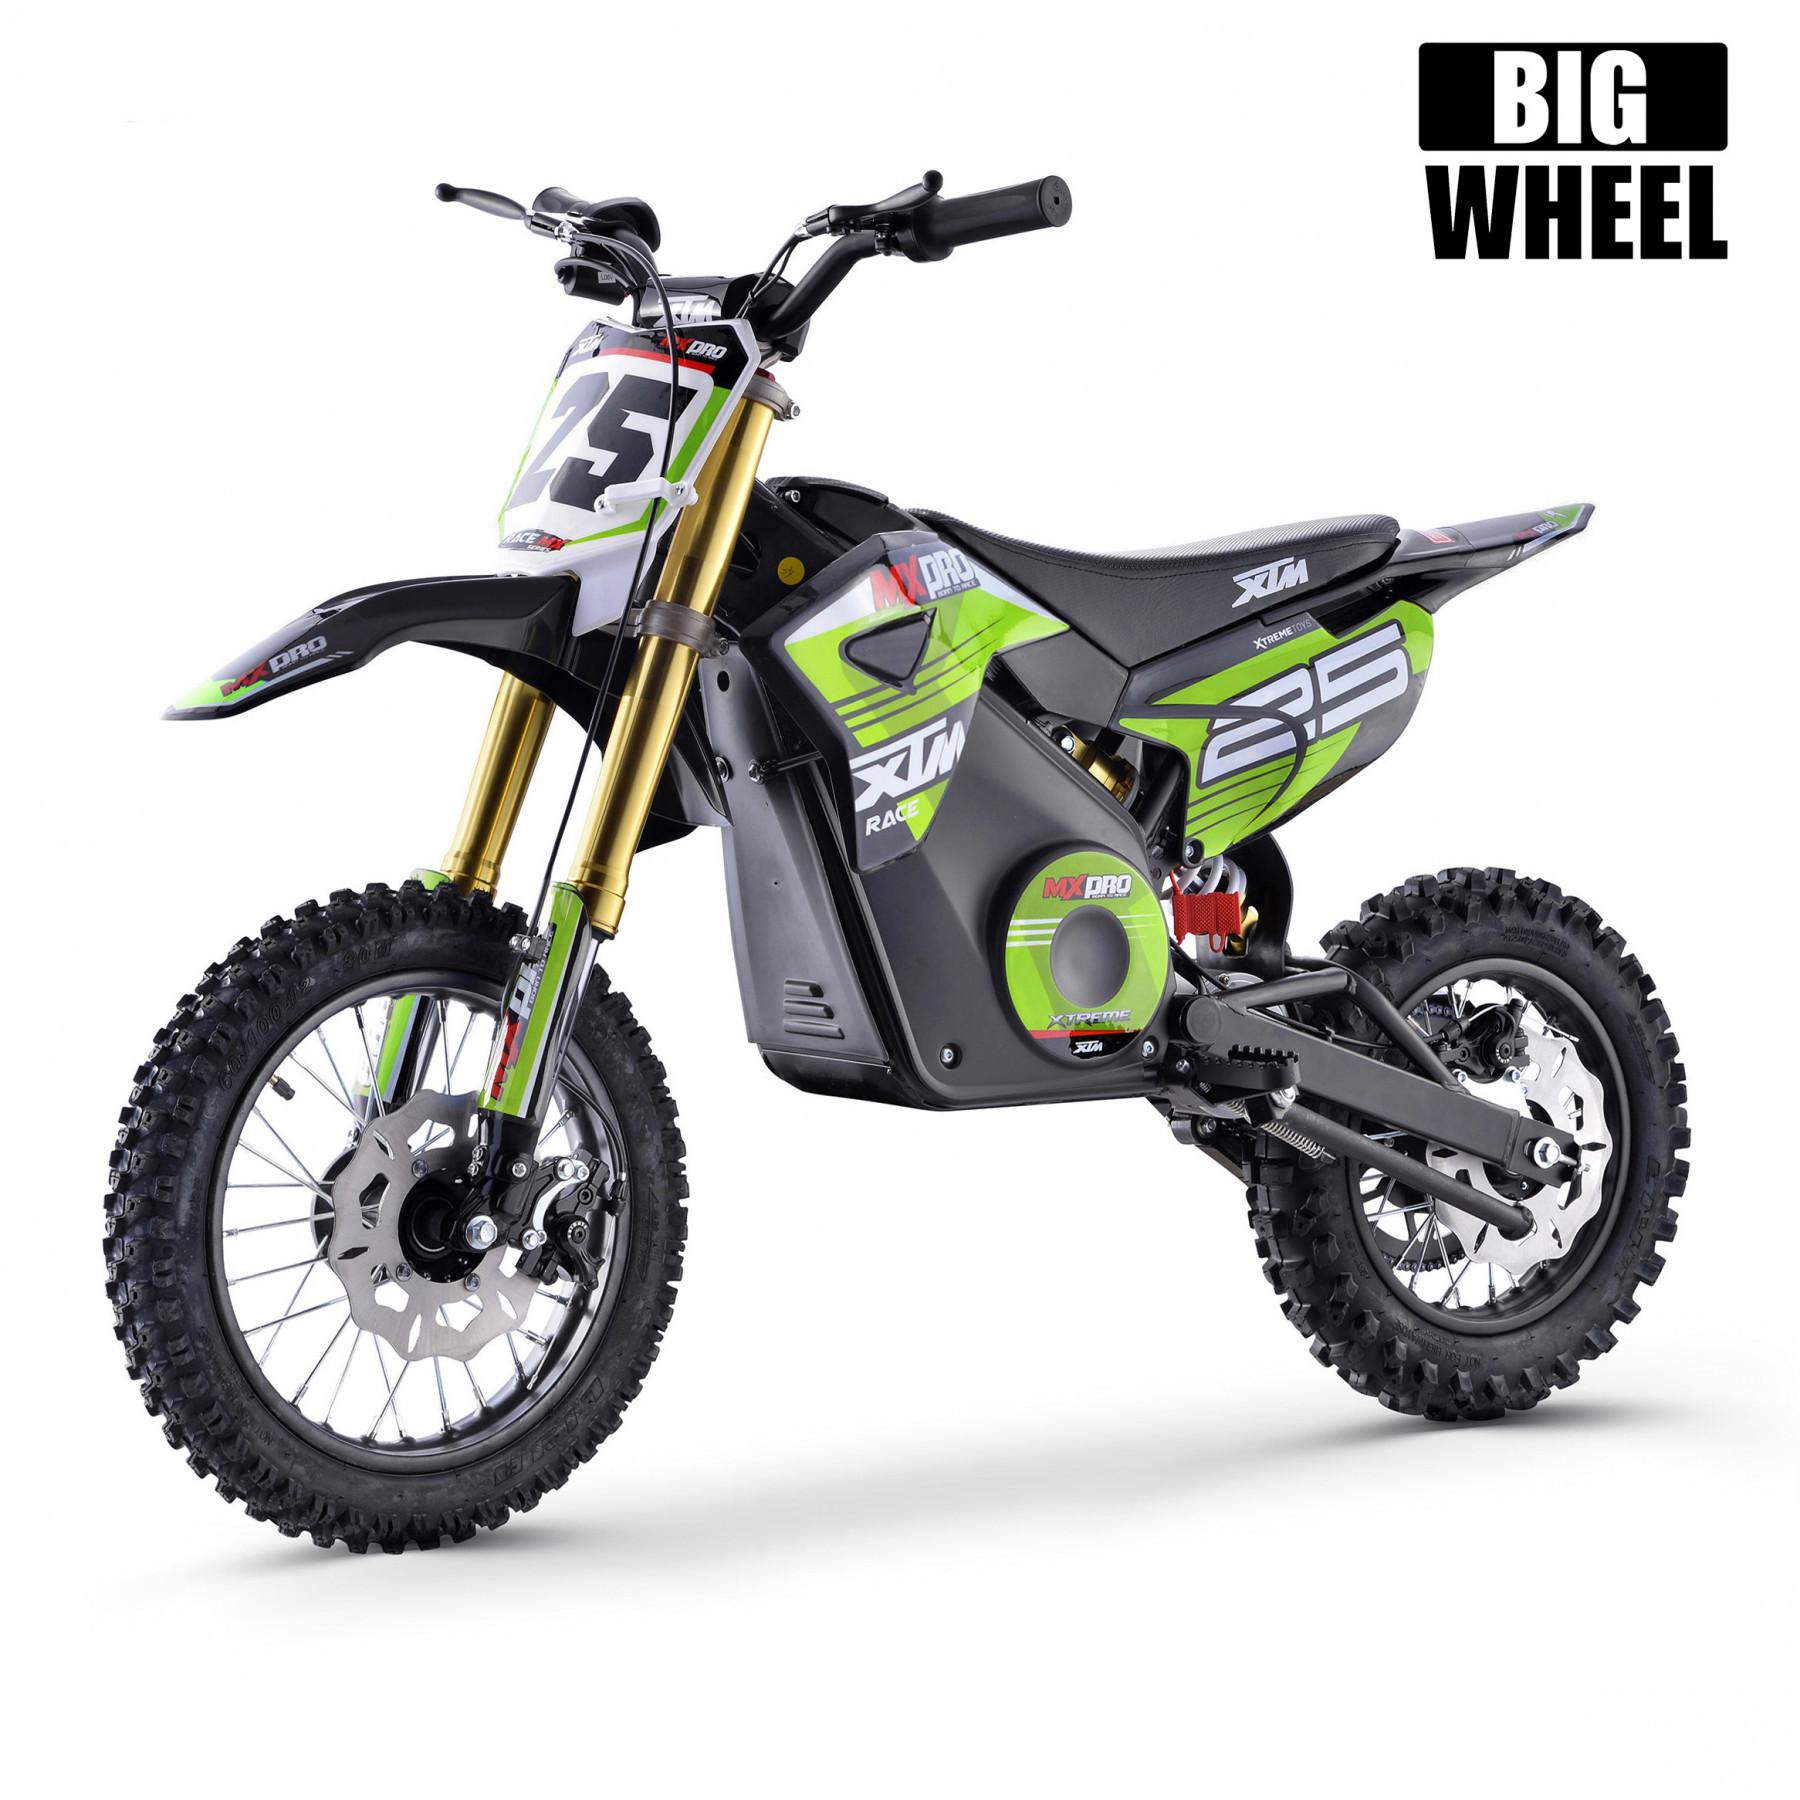 Xtm Mx Pro 48v 1300w Big Wheel Lithium Dirt Bike Green